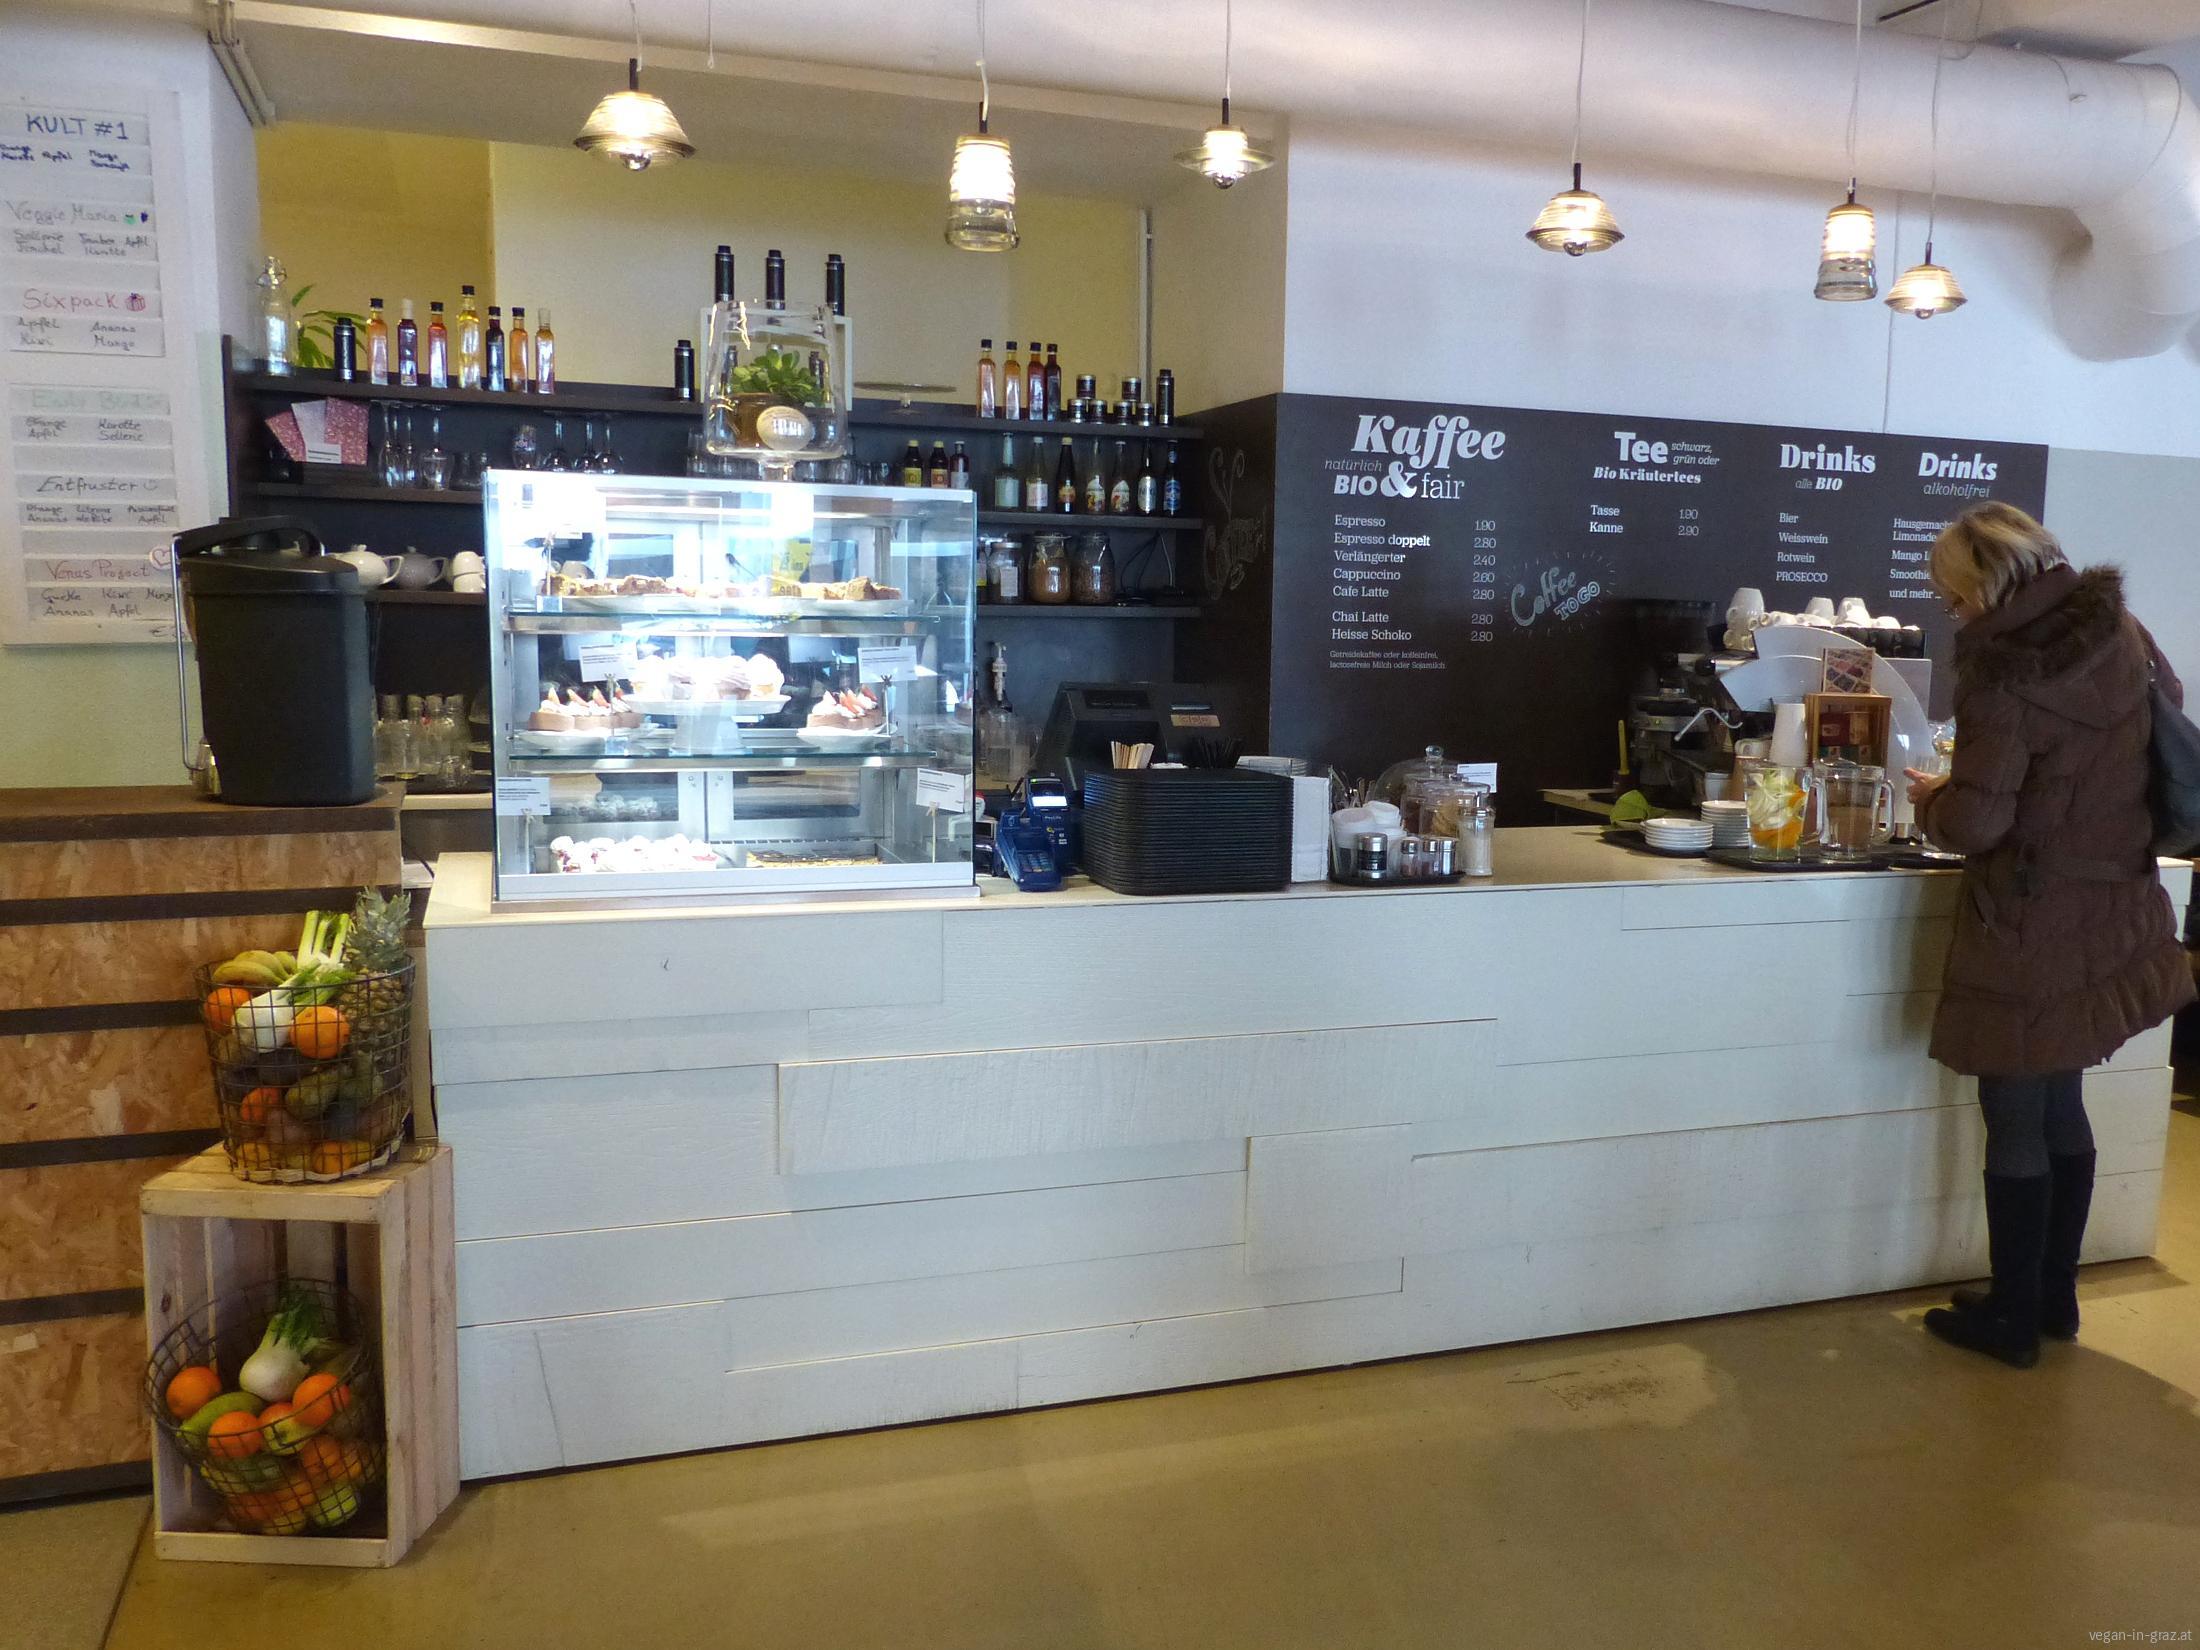 Mangolds Cafe